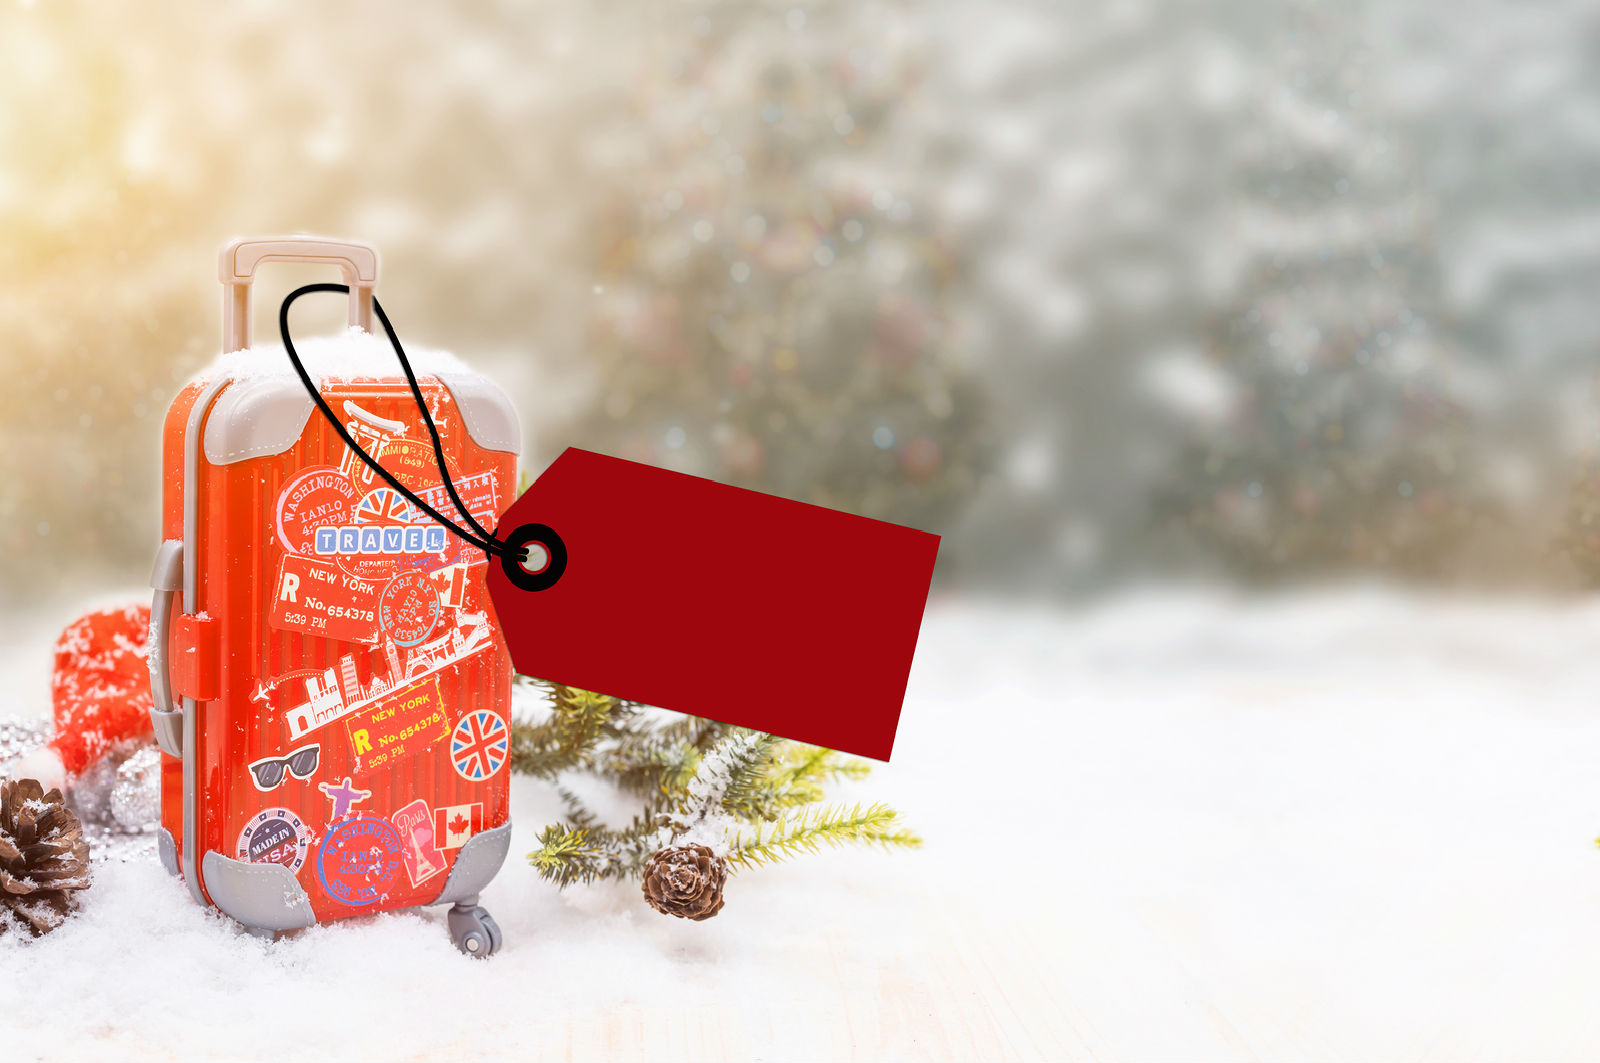 10 Reasons You Should Consider a Christmas Vacation